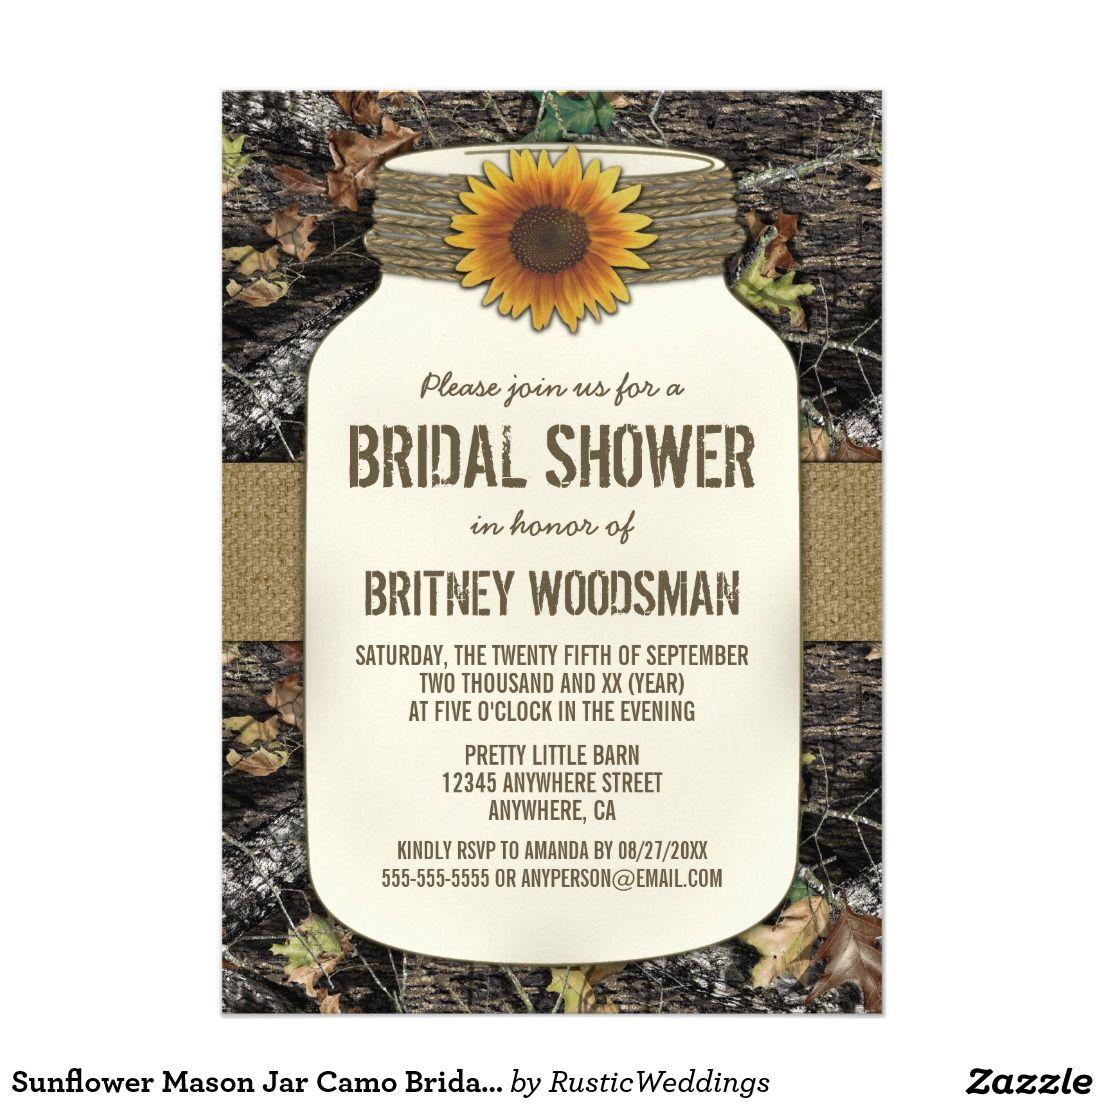 Sunflower Mason Jar Camo Bridal Shower Invitations | Camo & Hunting ...